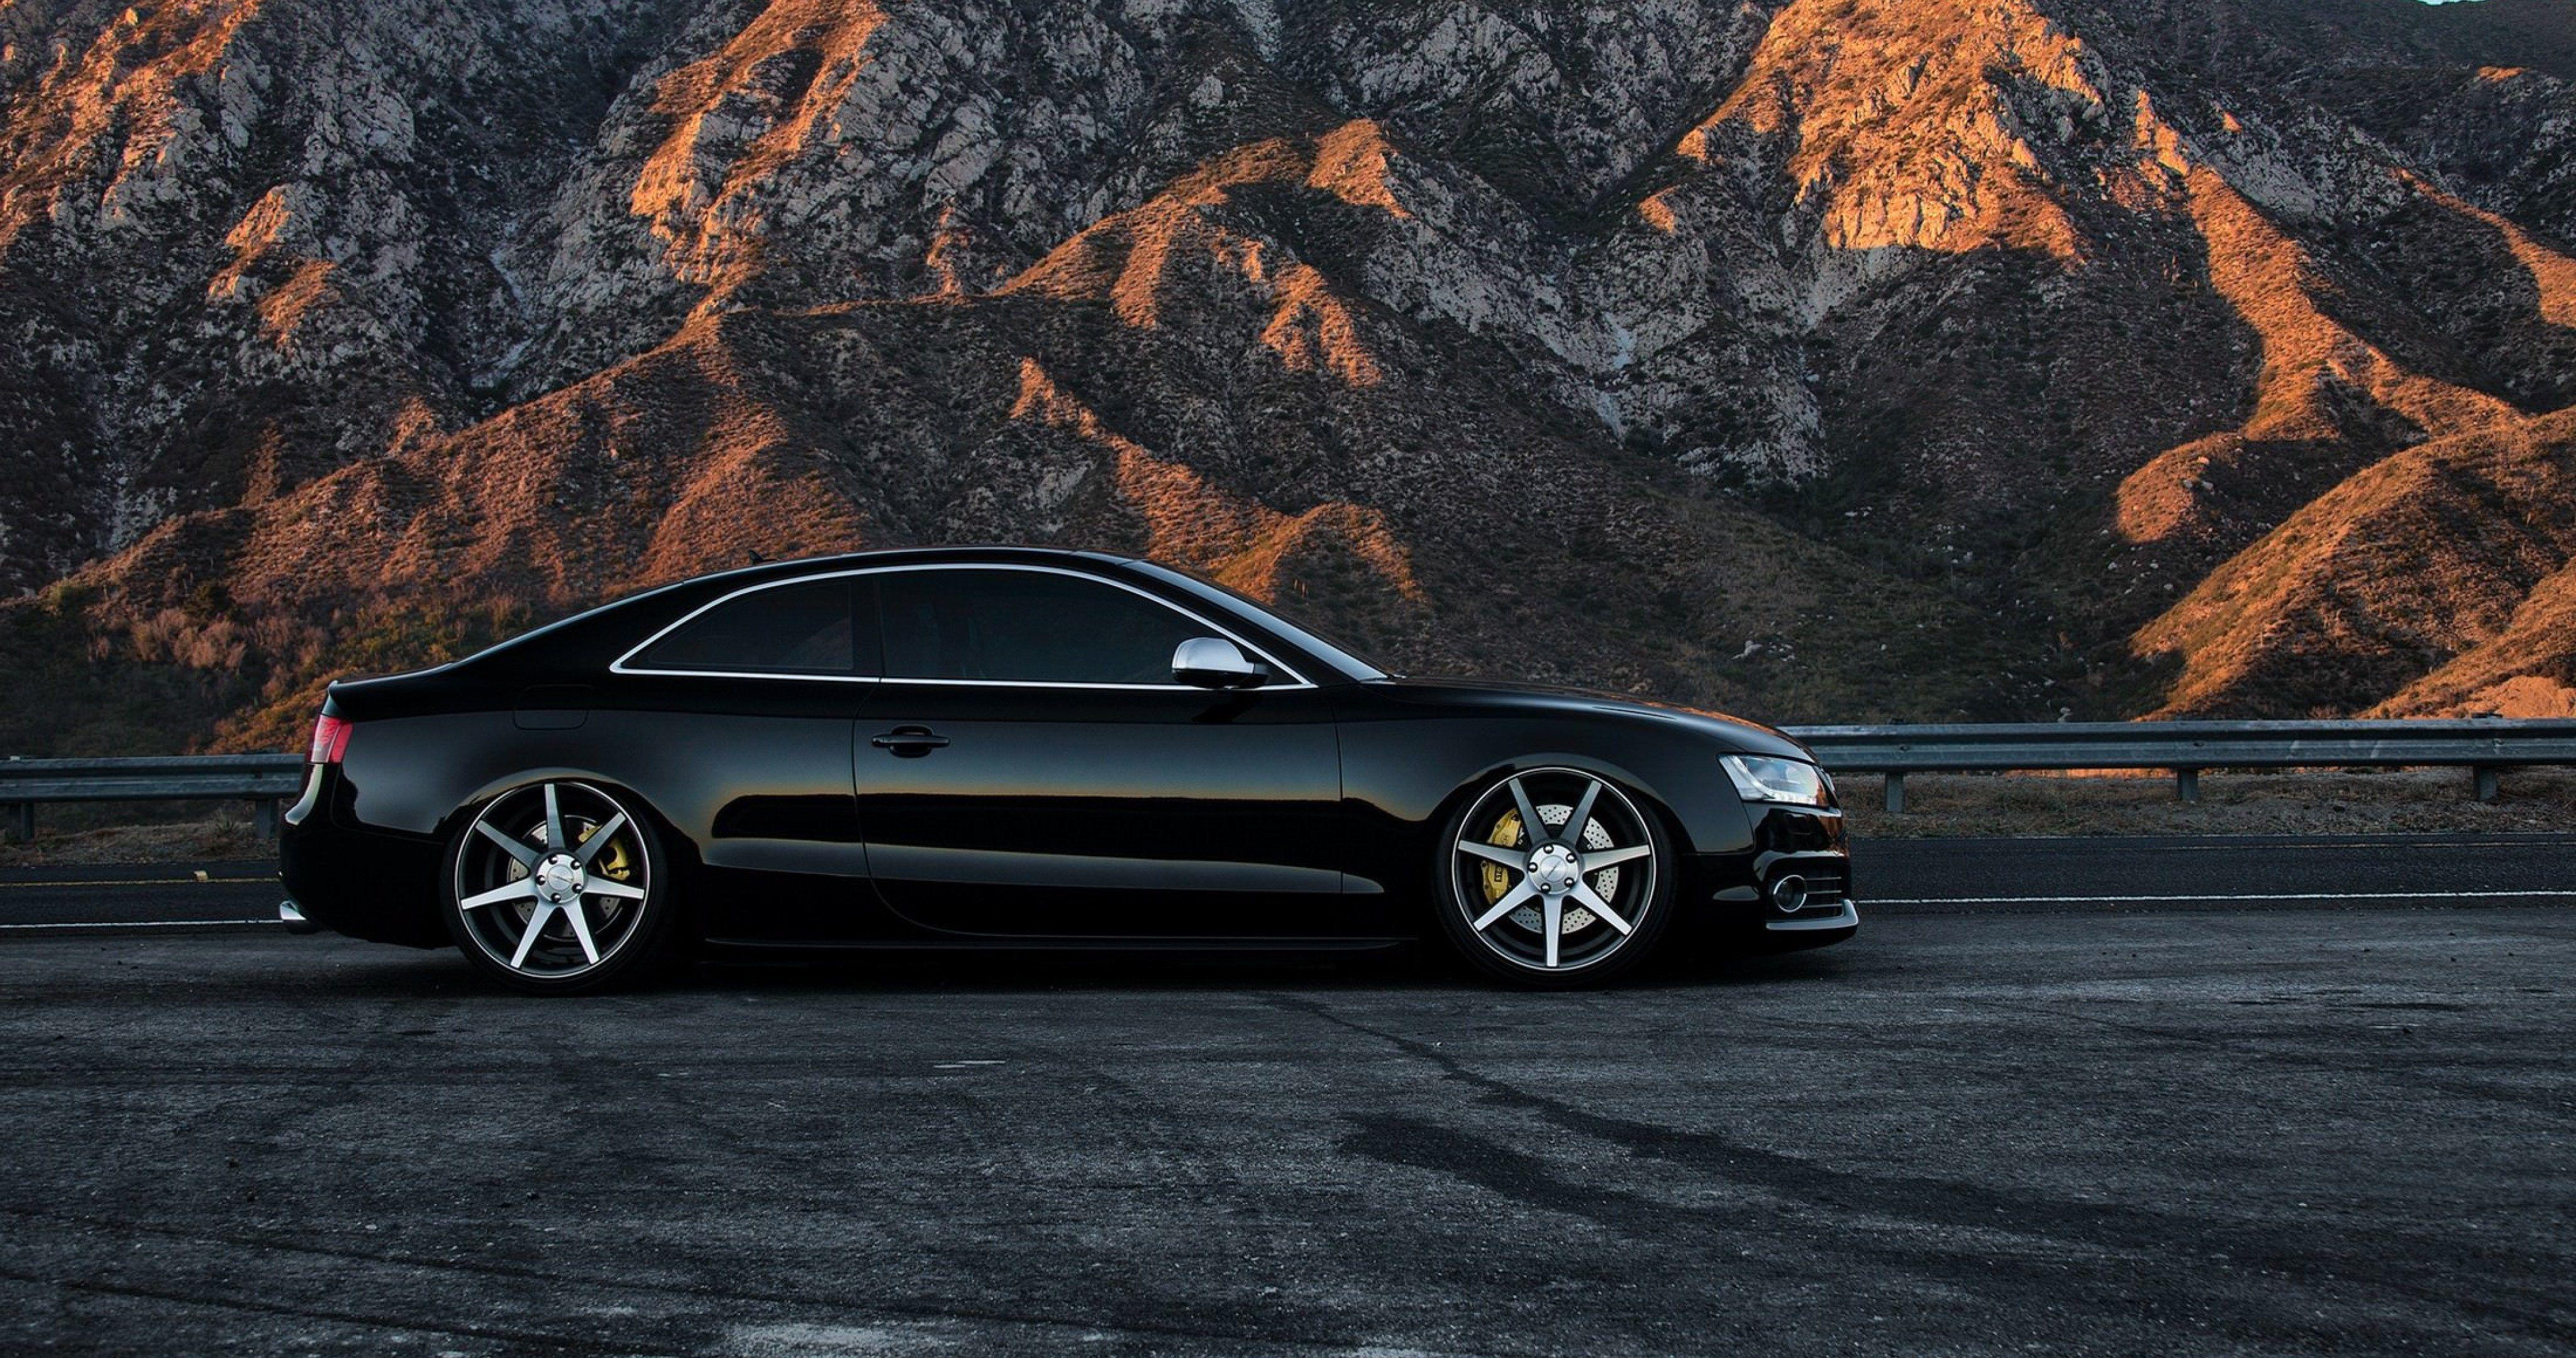 Audi rs5 4k ultra hd wallpaper ololoshenka black audi audi s5 audi rs5 - Car wallpapers for galaxy s5 ...